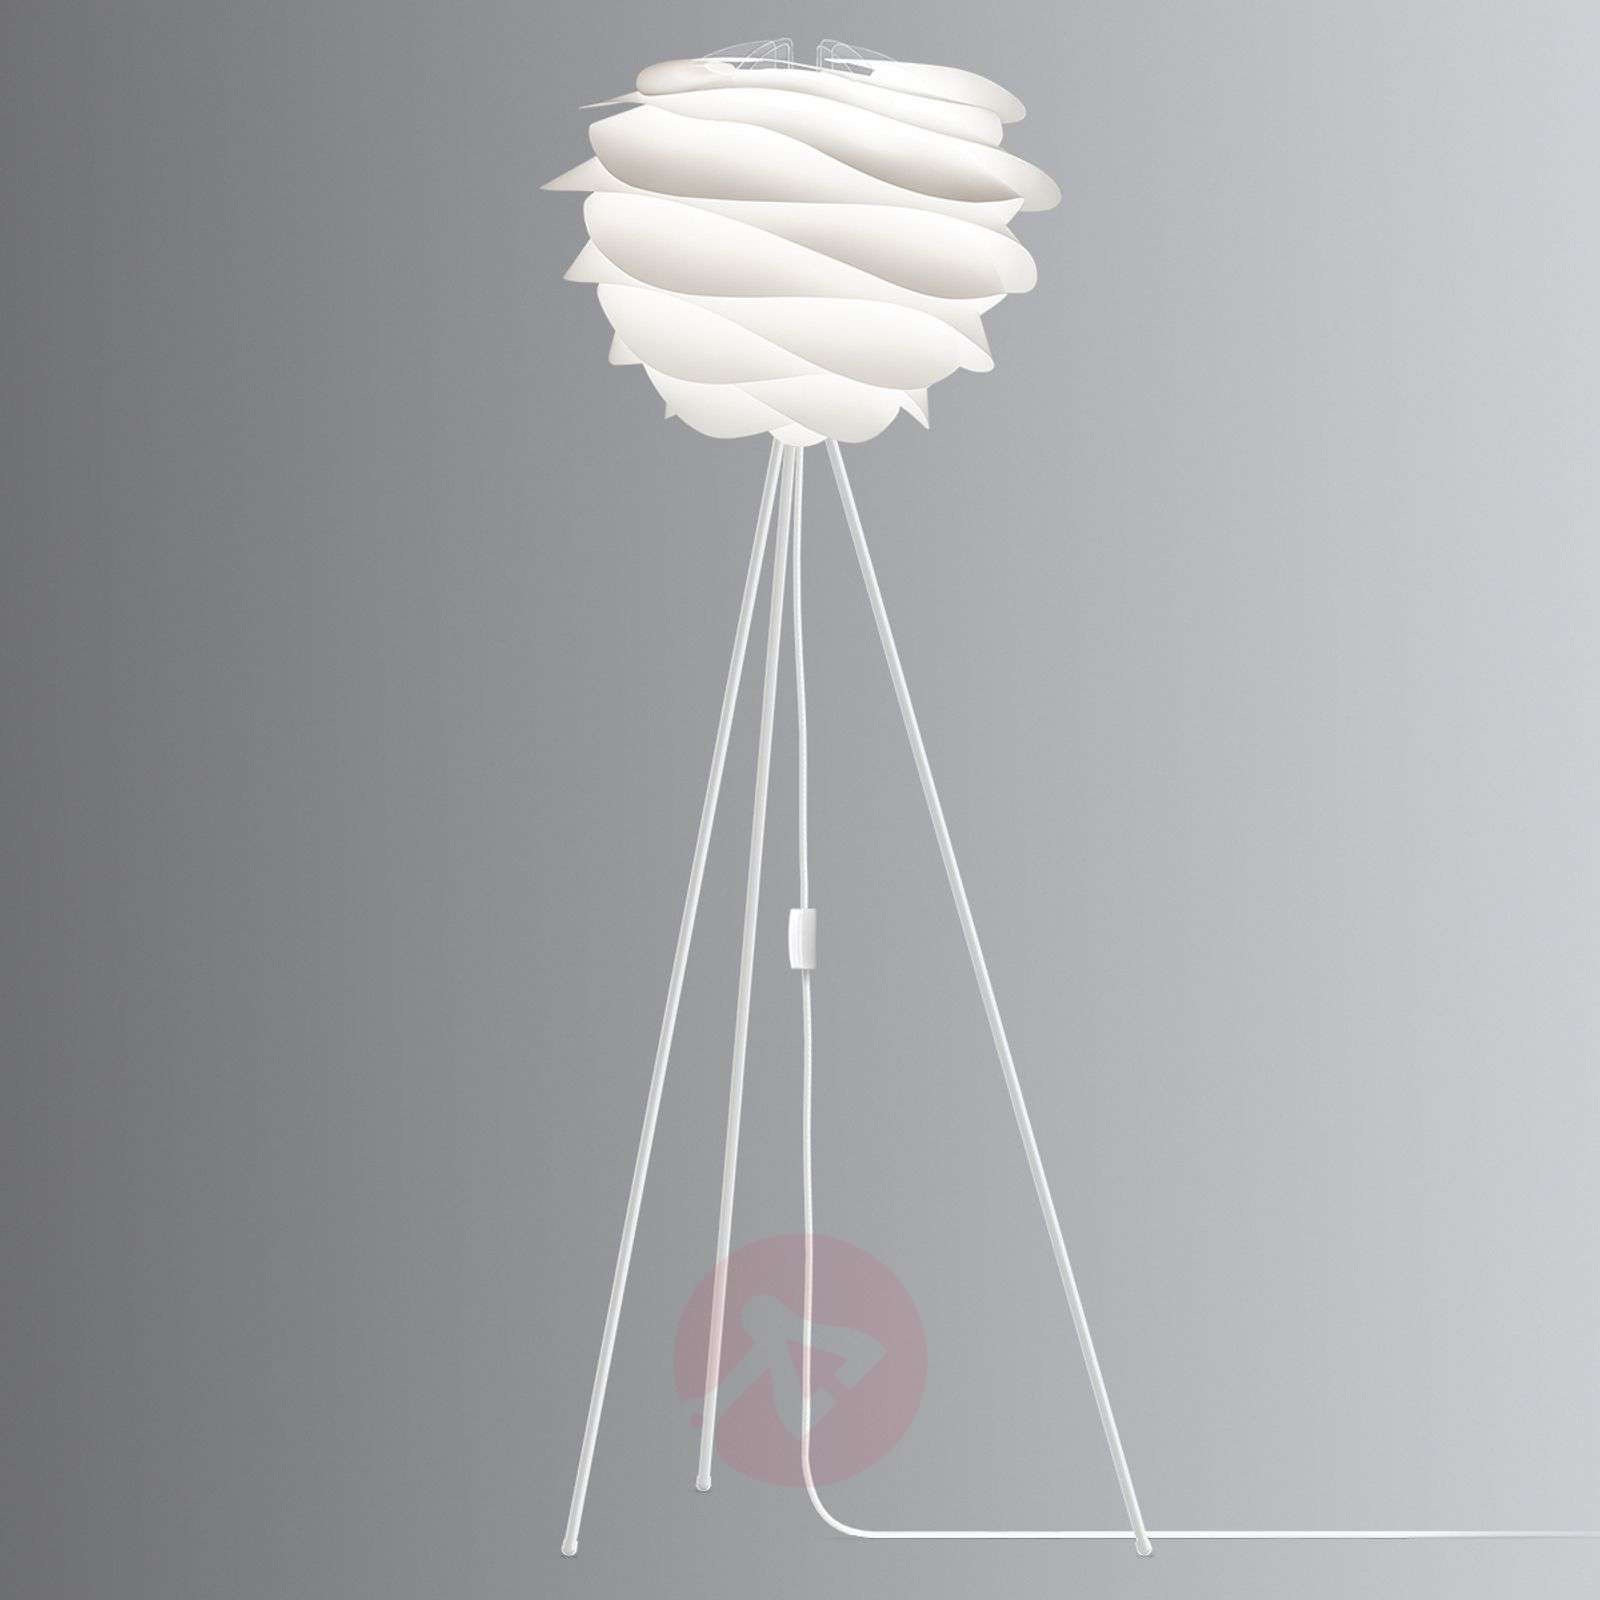 UMAGE Carmina floor lamp tripod in white-9521114-01